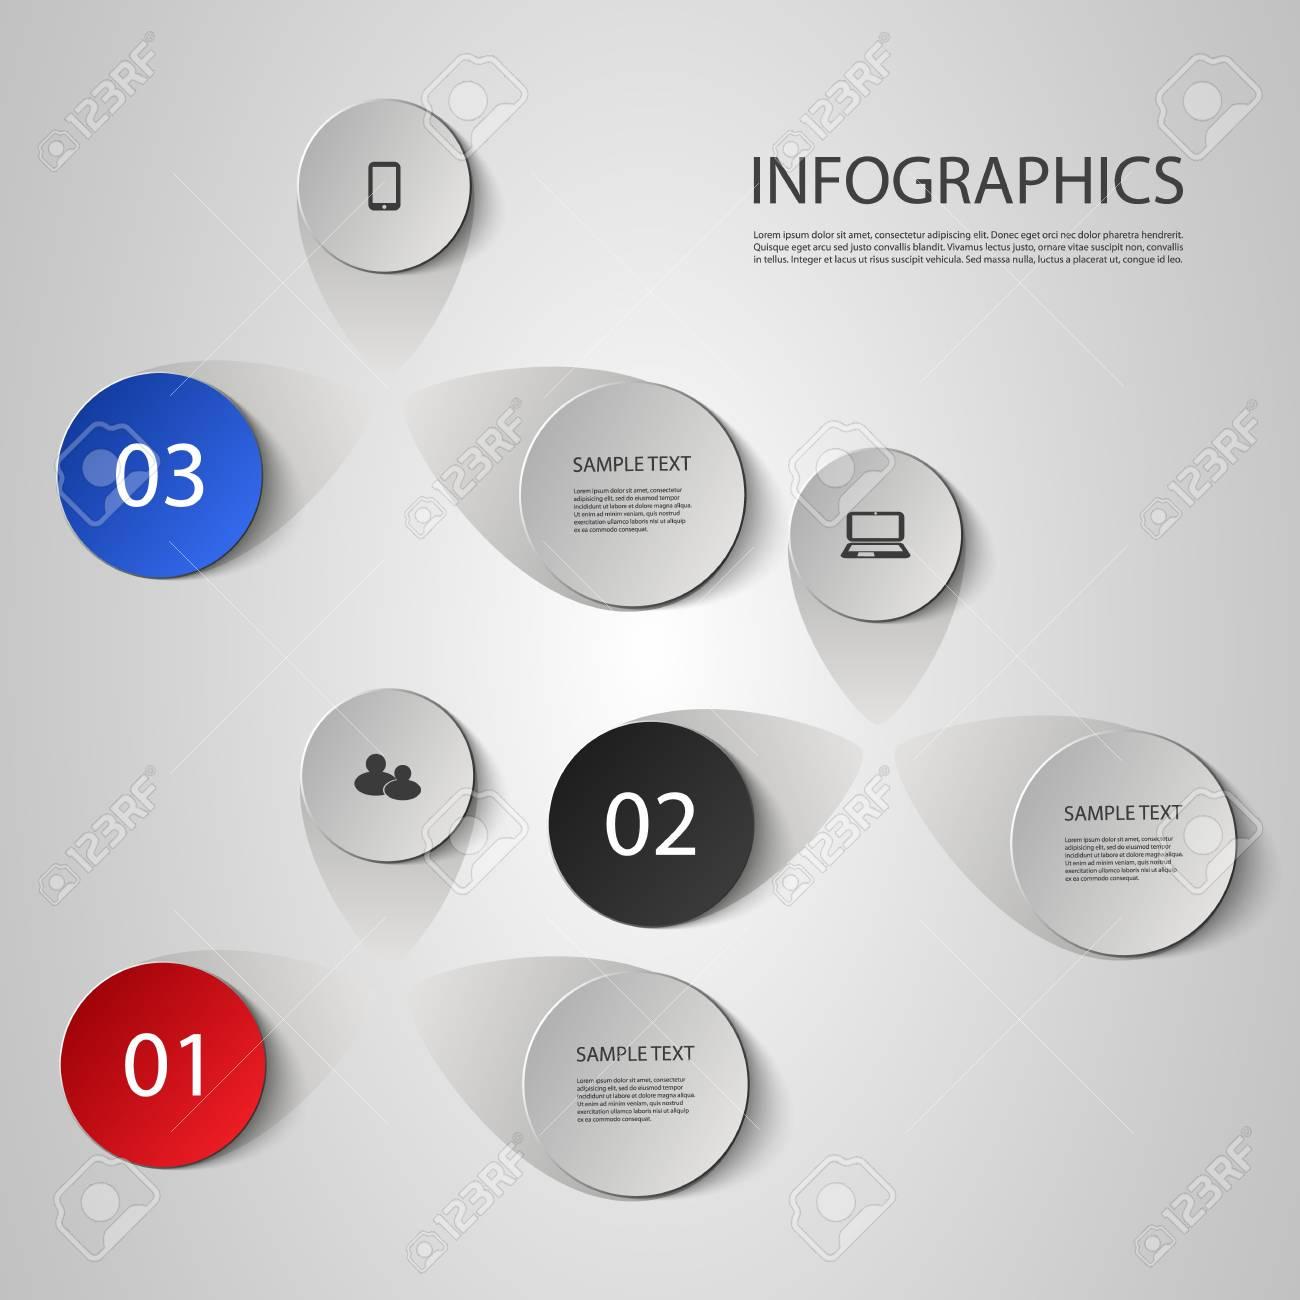 Infographic Design Stock Vector - 19629554